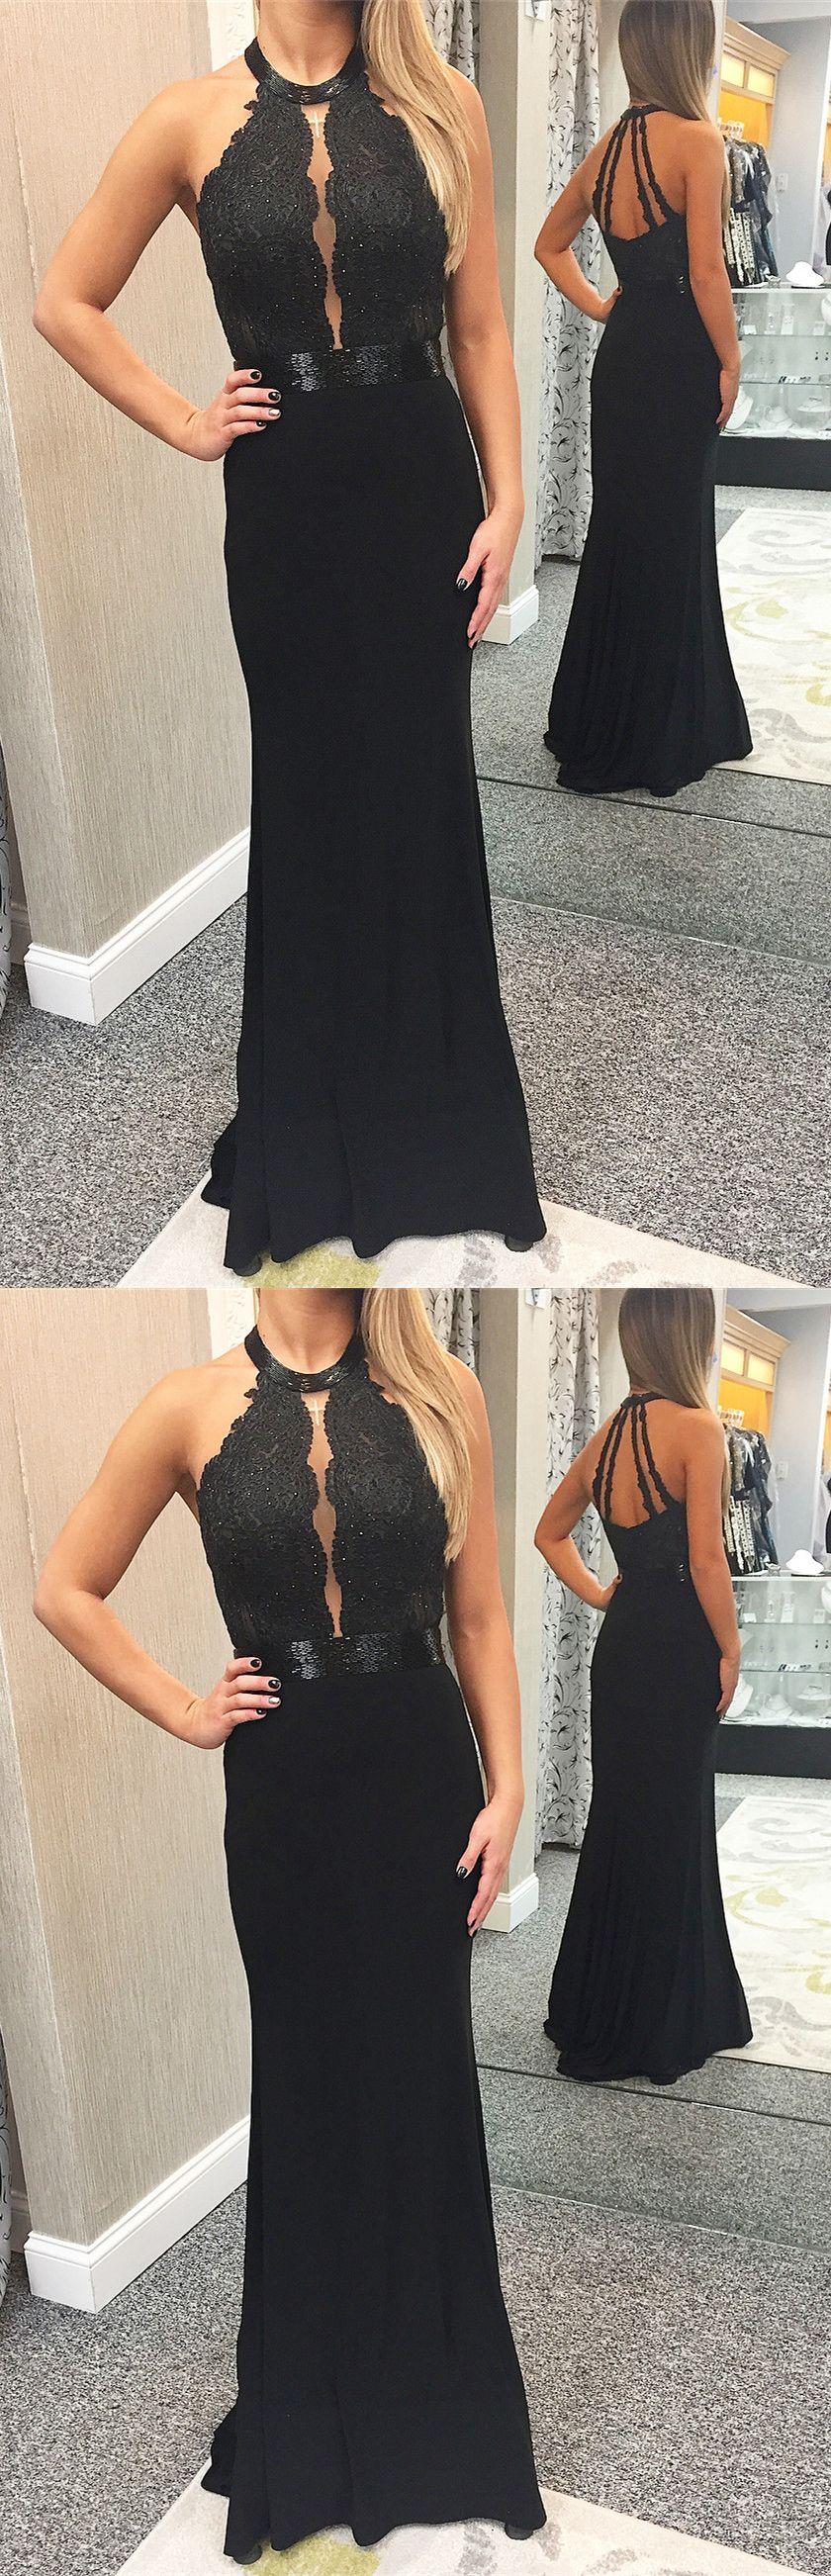 Mermaid jewel black long promevening dress promdresses